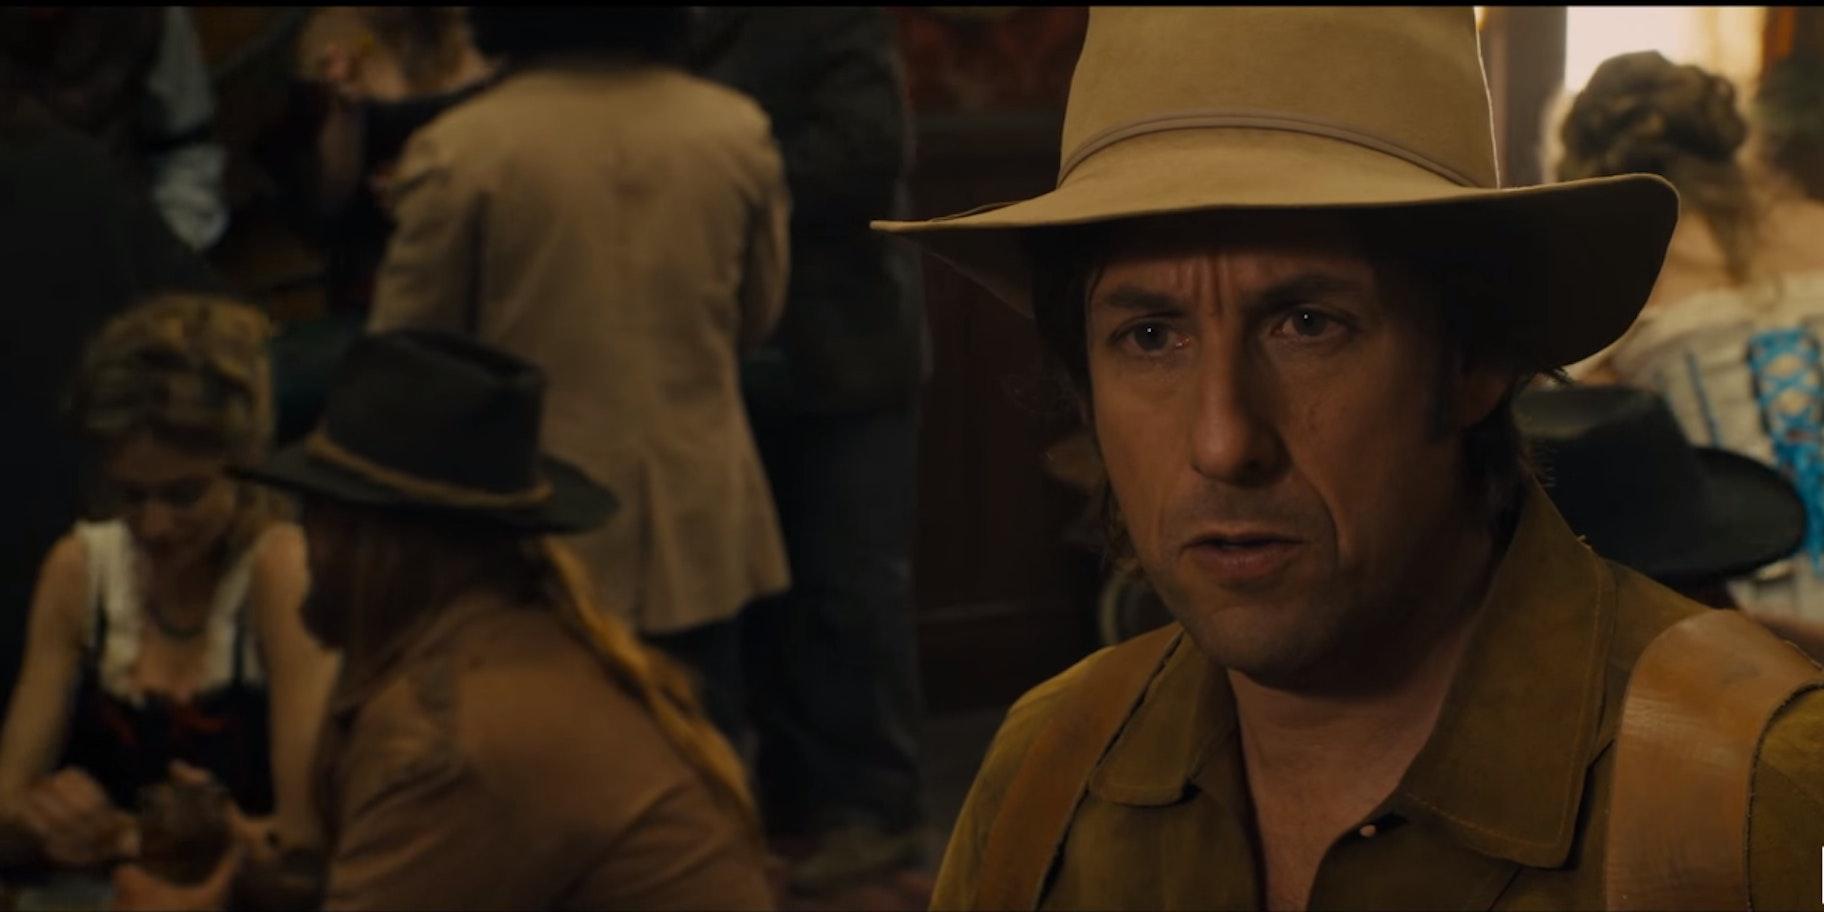 Netflix Debuts Trailer to New Adam Sandler Original, 'The Ridiculous 6'